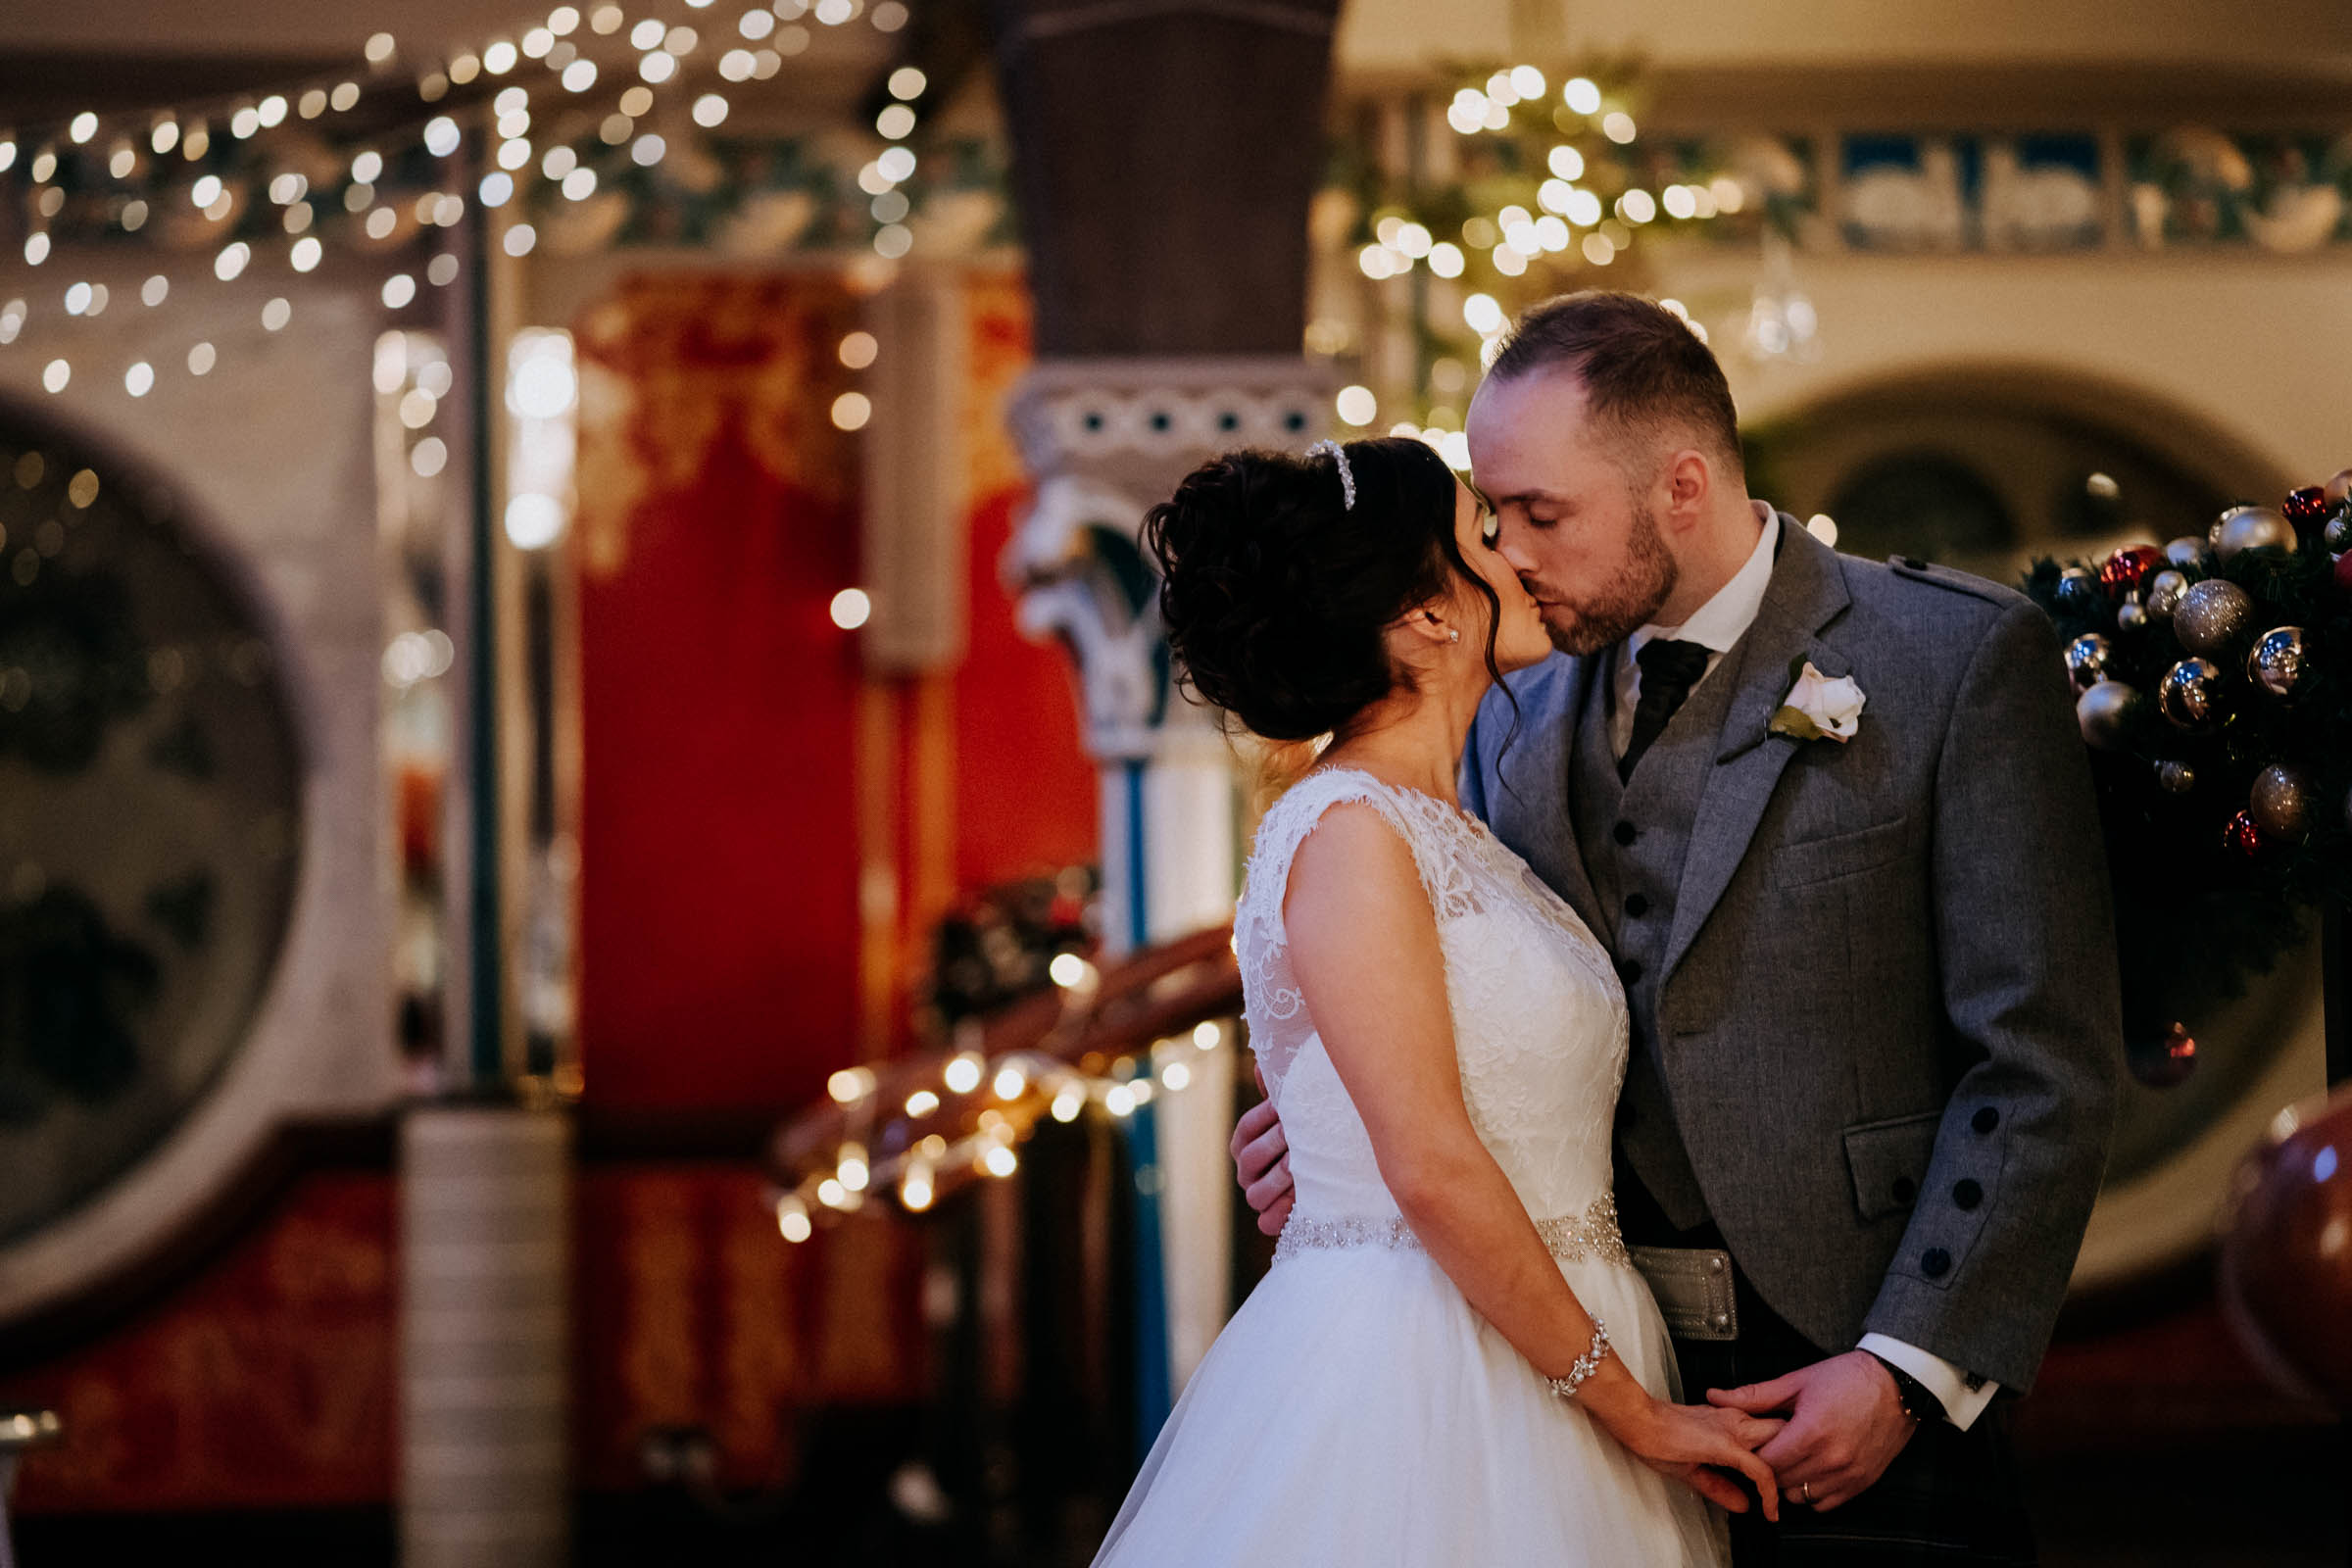 Oran-Mor-Wedding-Photographer-DearlyPhotography (55 of 55).jpg